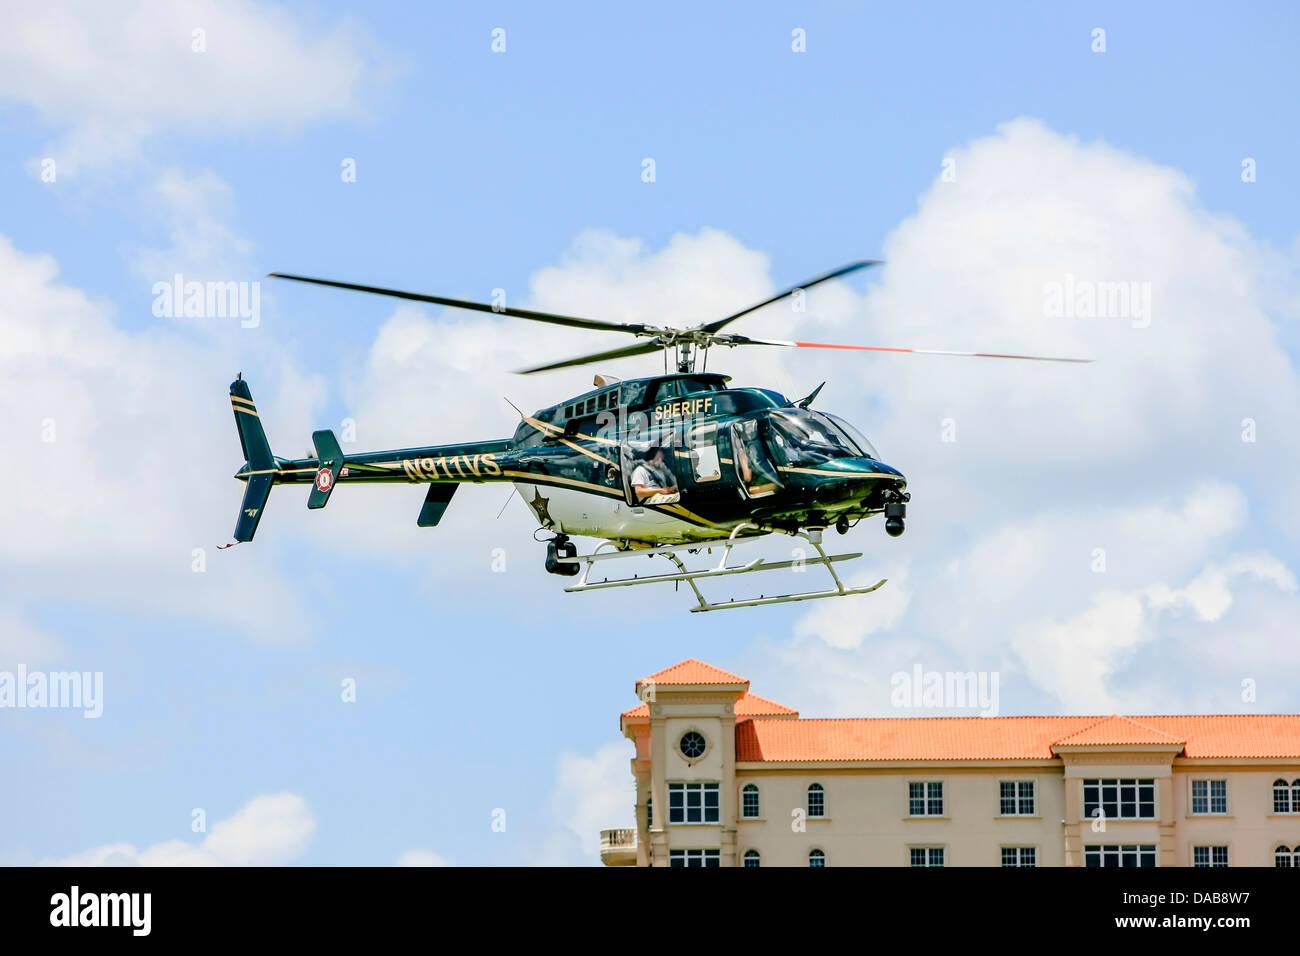 Elicottero Jet Ranger : La polizia di sarasota bell jet ranger elicottero rendendo una